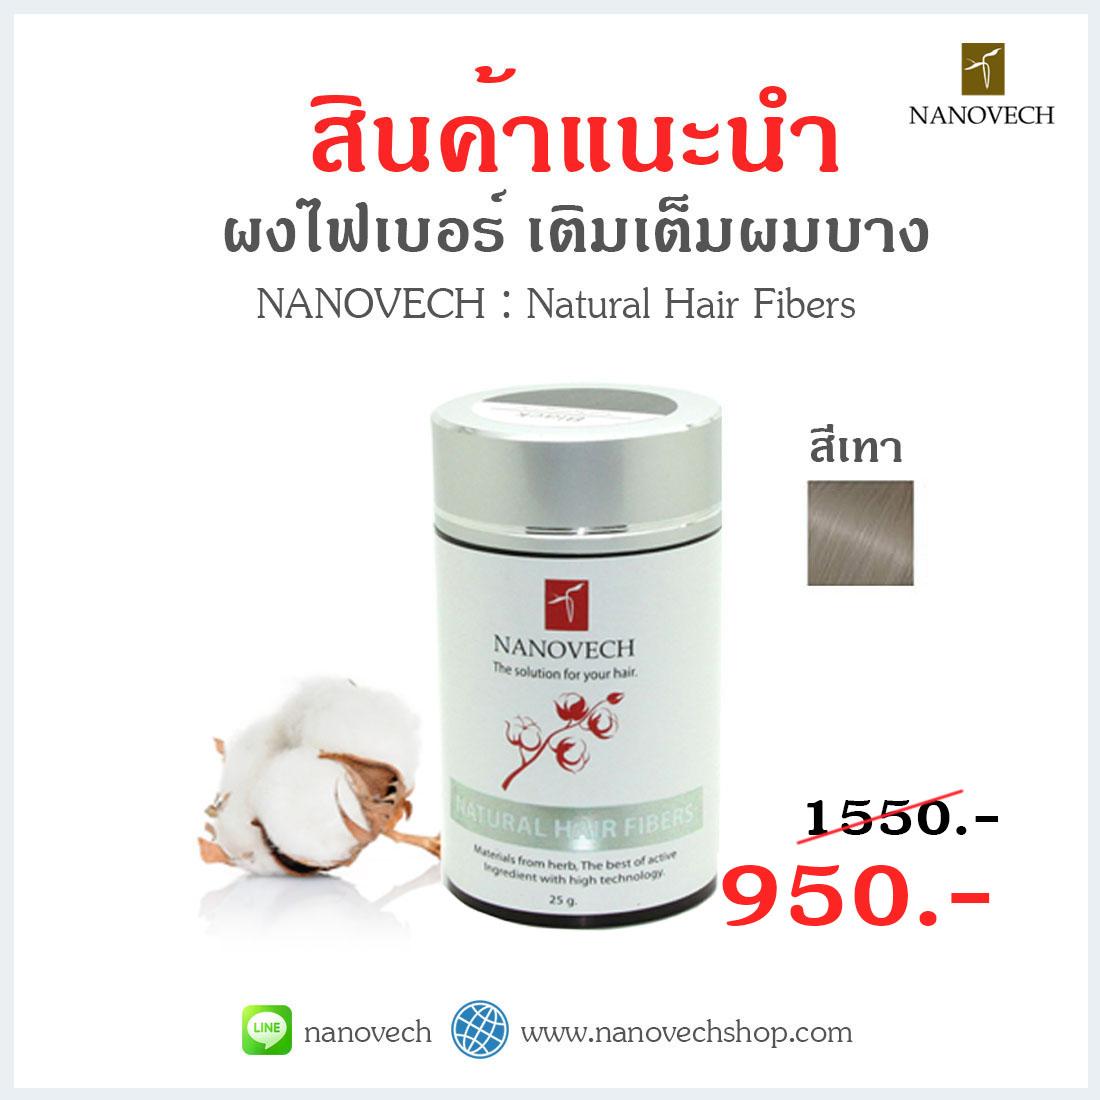 Nanovech : Natural Hair Fibers (สีเทา)